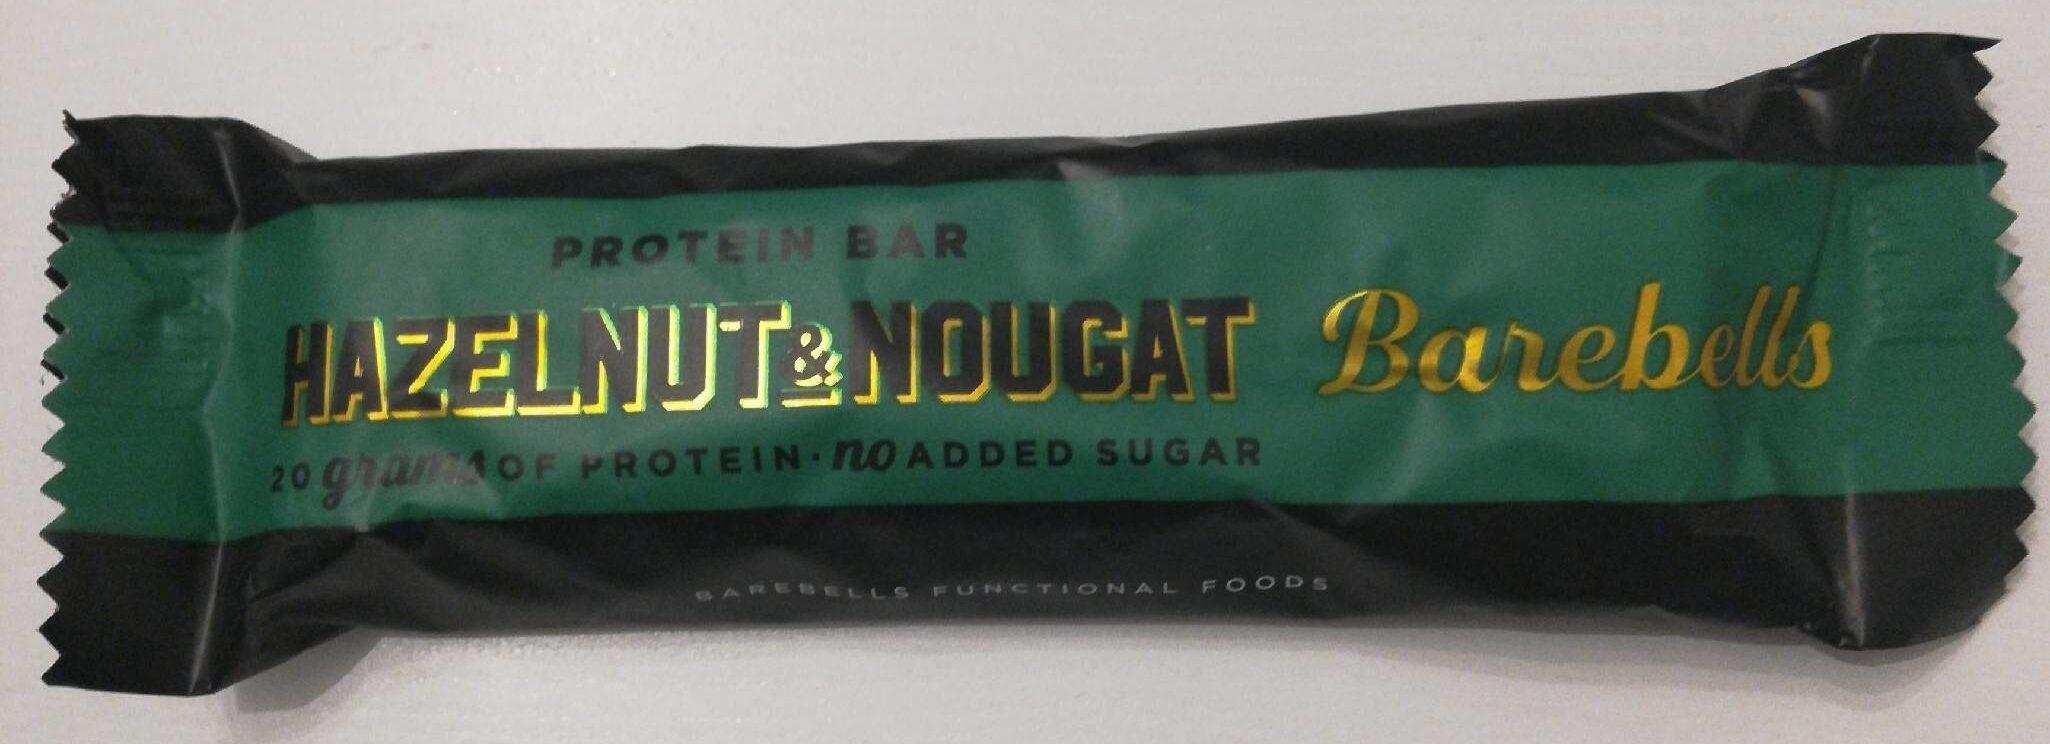 Protein Bar hazelnut & nougat - Produit - fr